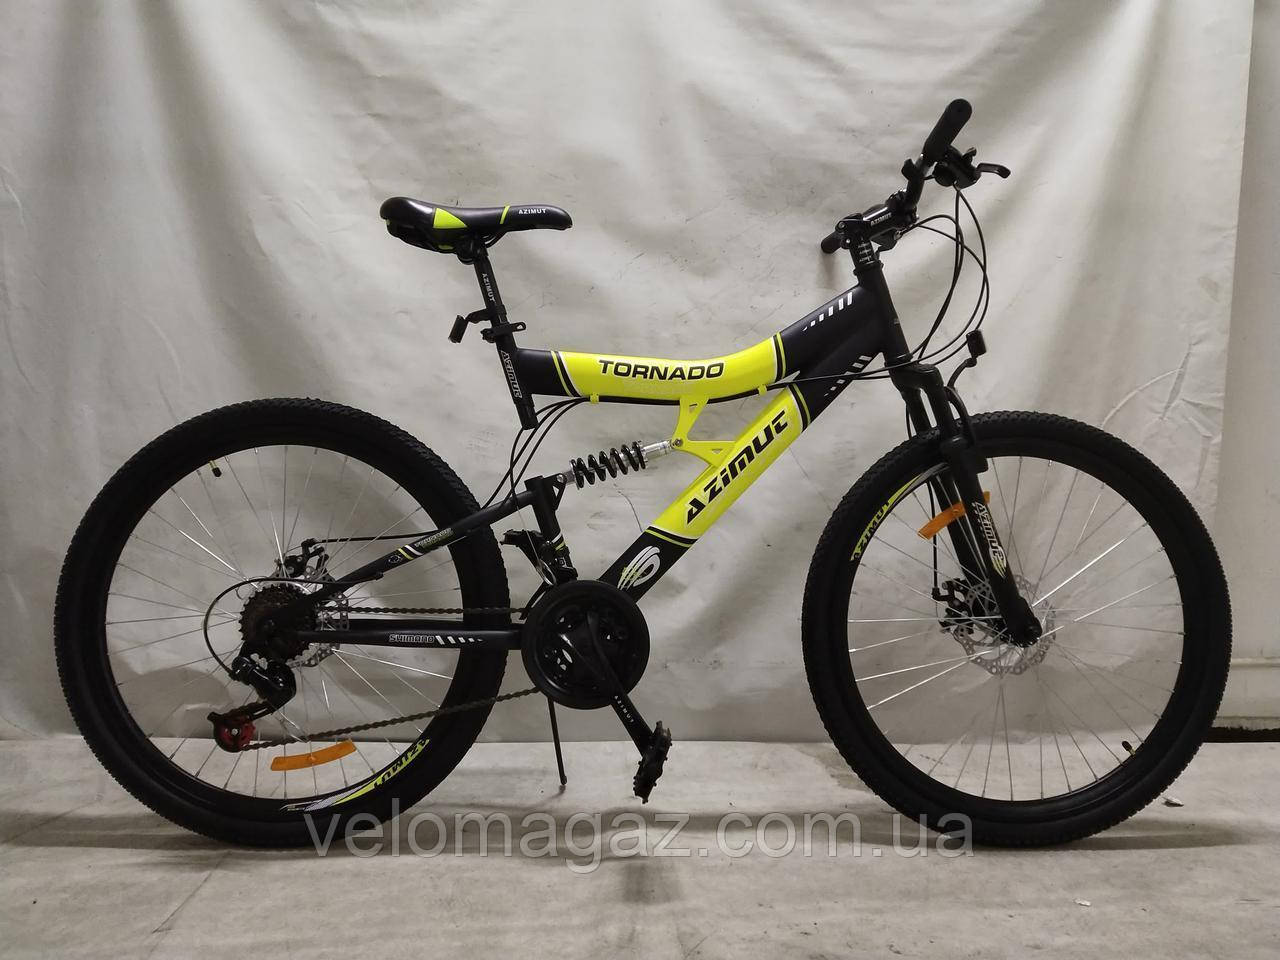 "Велосипед гірський двухподвесной Tornado 26"" рама 19"" чорно-жовтий"